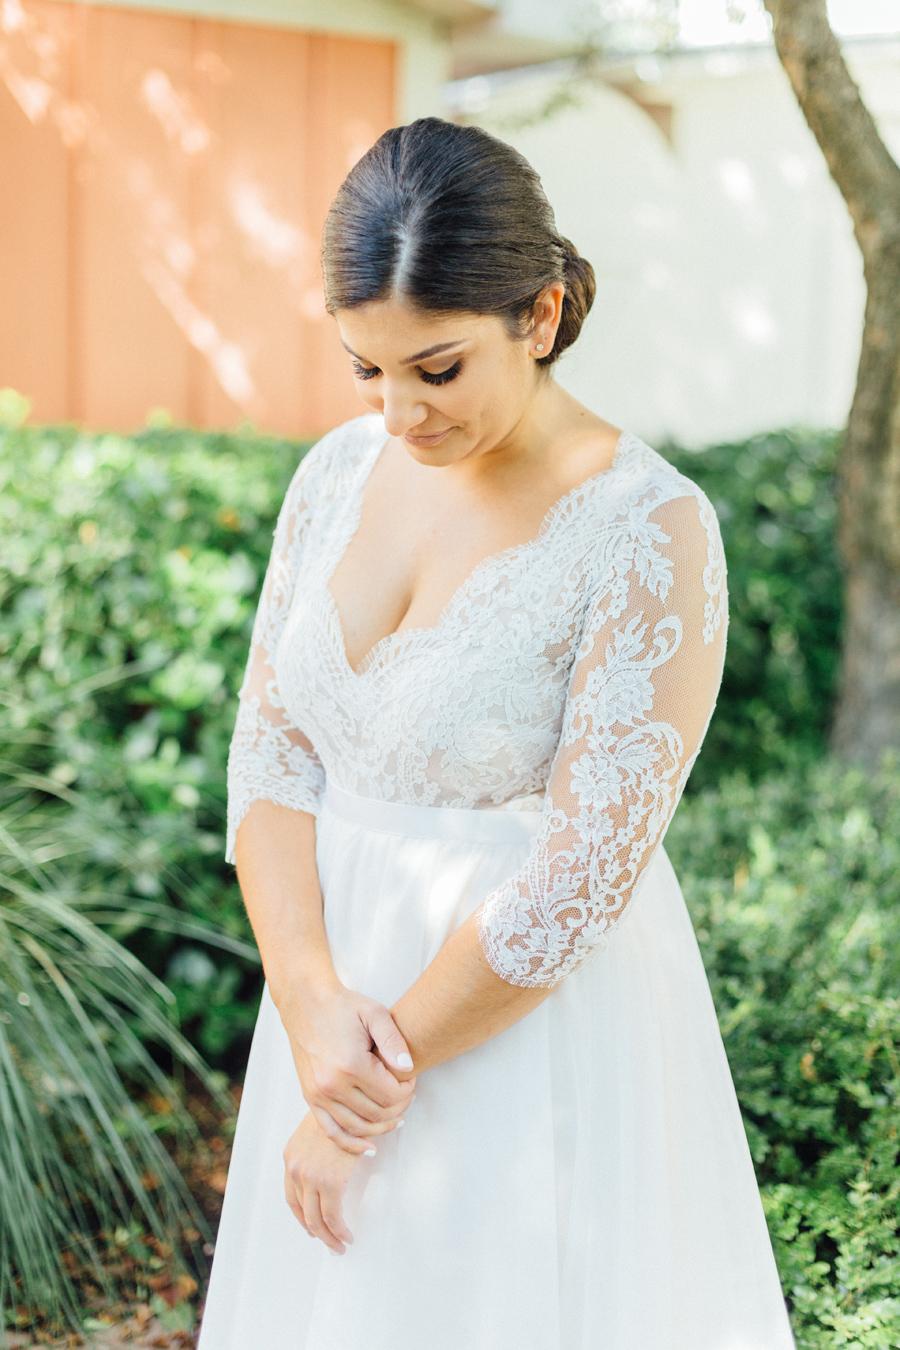 the-inn-at-leola-wedding-lancaster-pennsylvania-wedding-photographer-rebeka-viola-photograhy (16).jpg